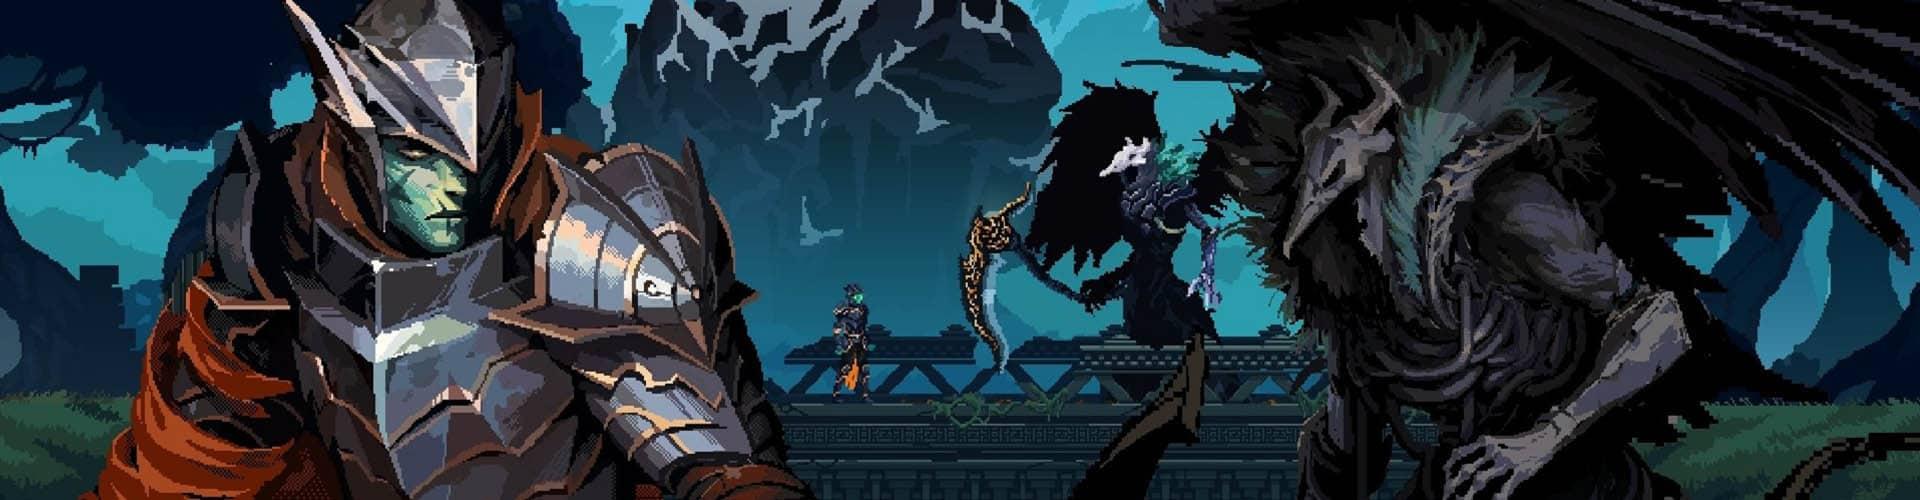 Best Games Like Dark Souls